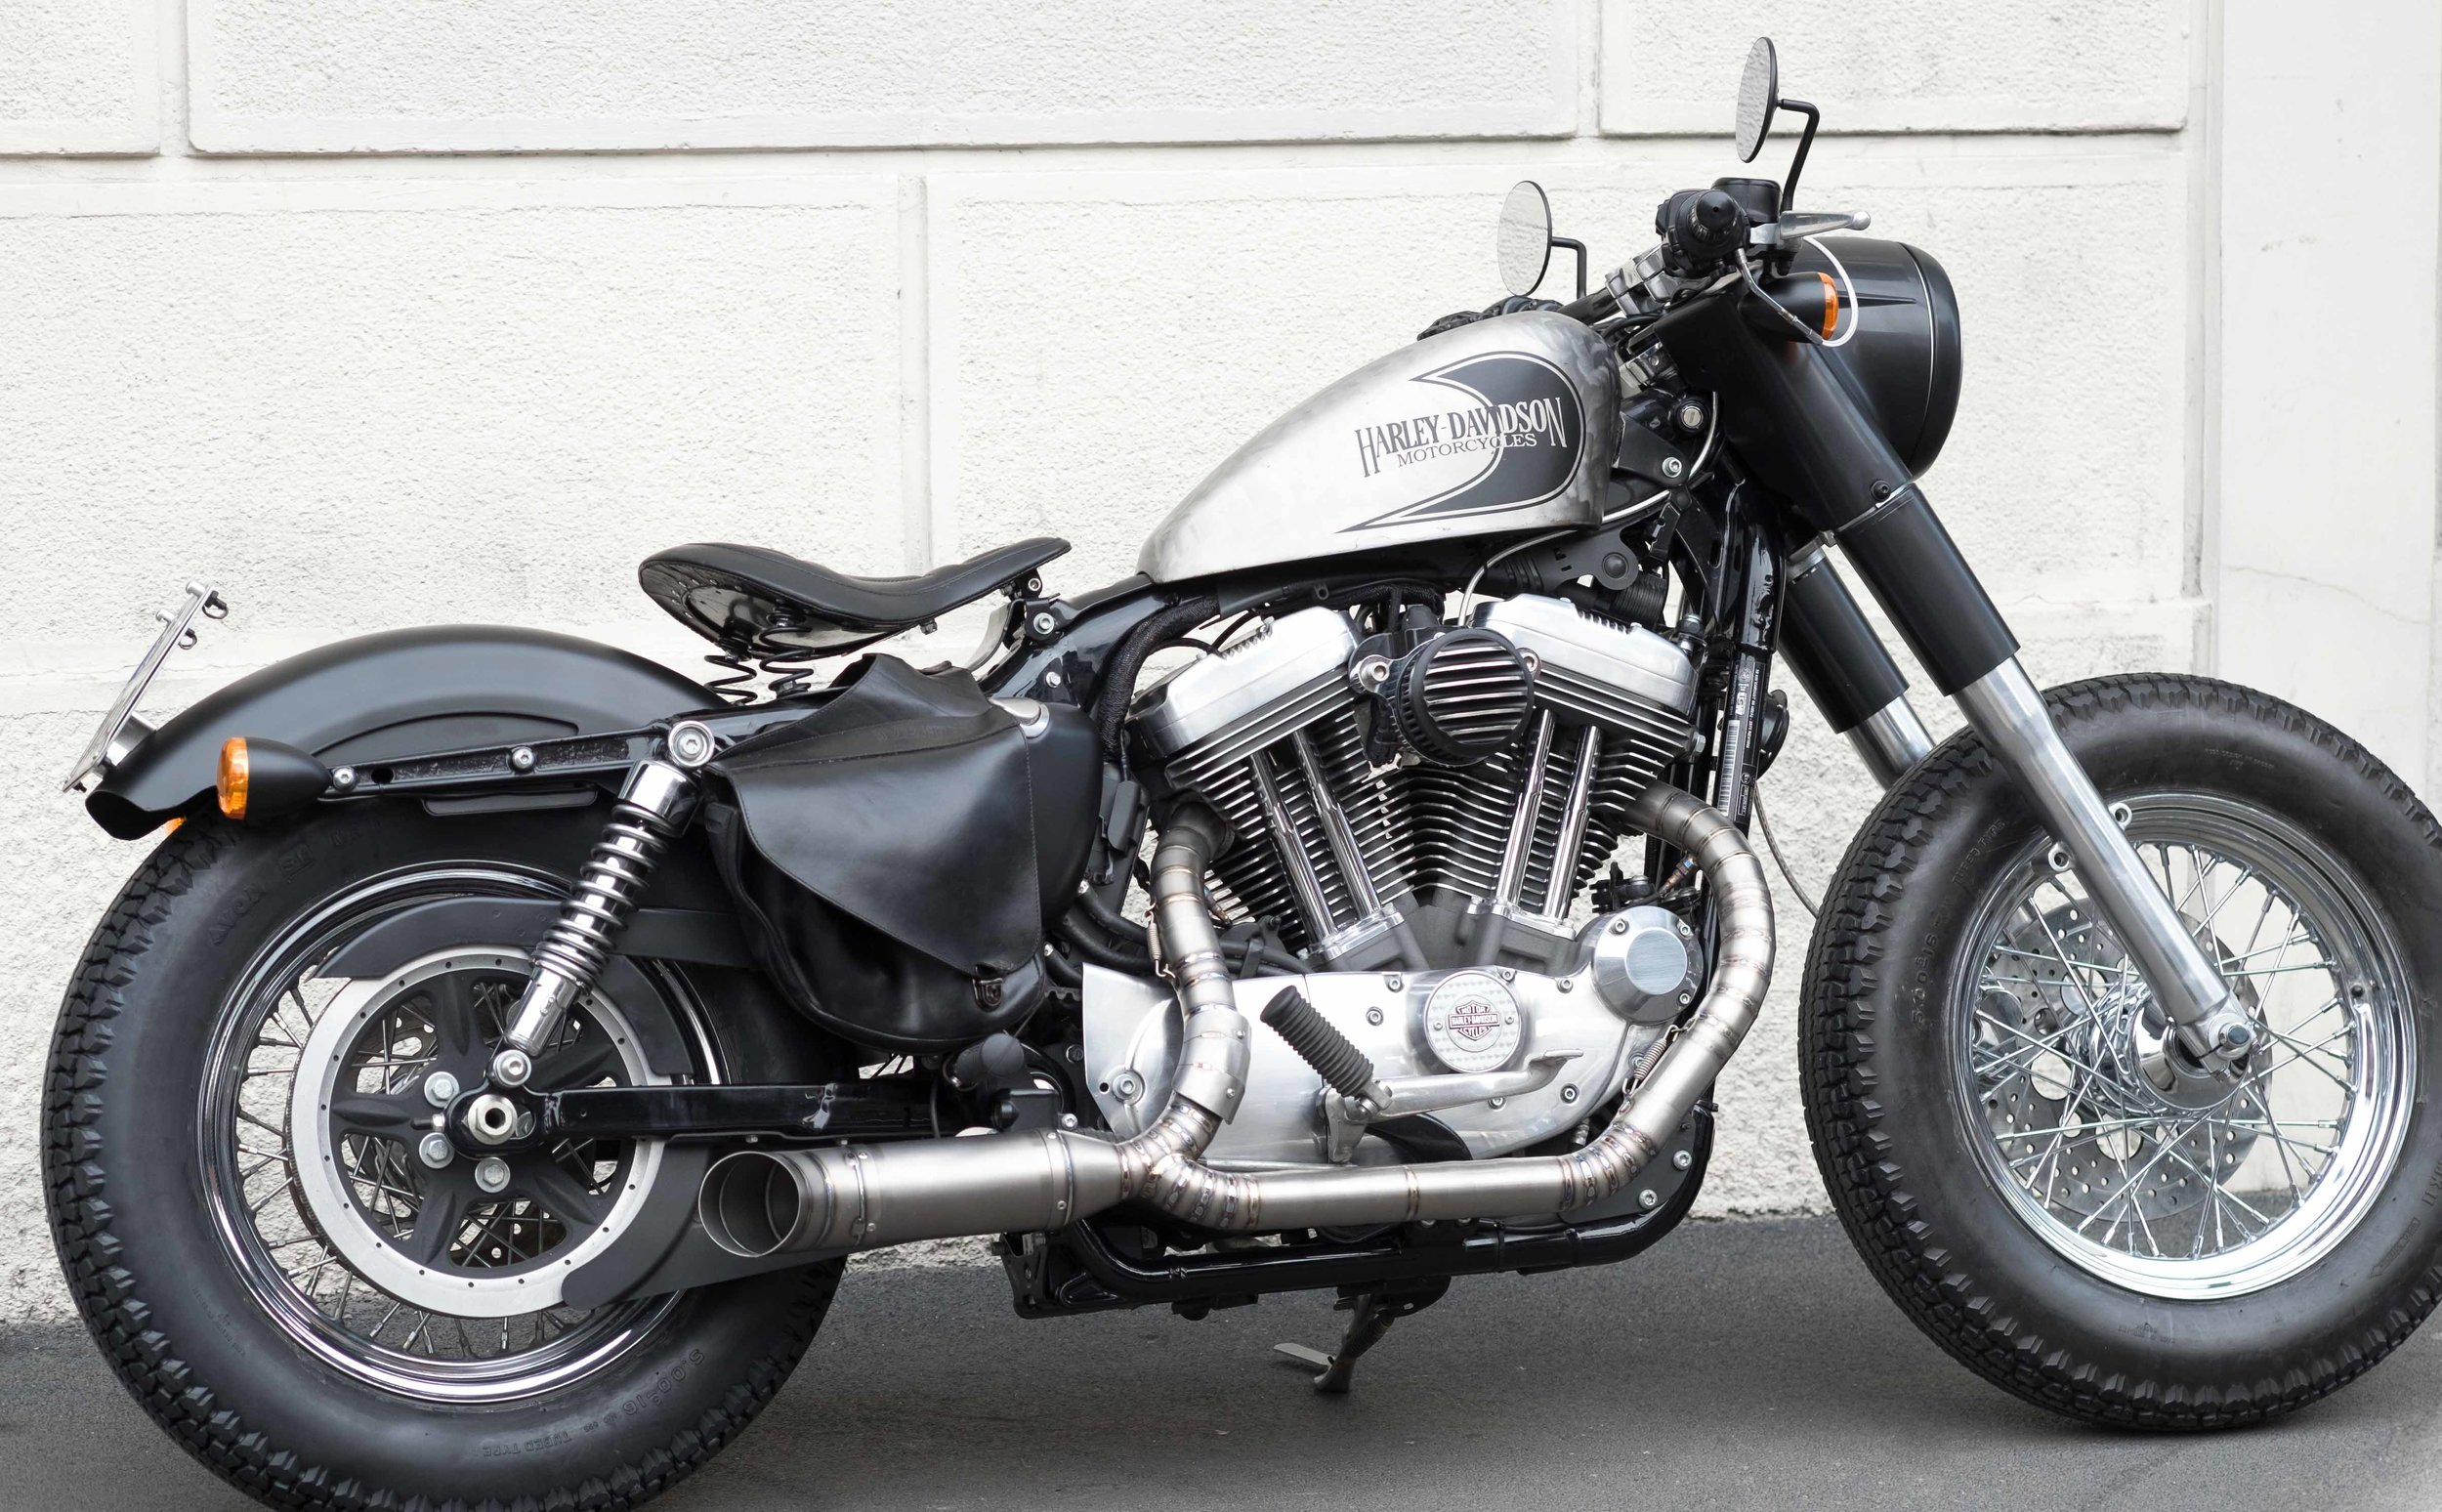 Marca: Harley Davidson Modello: Sportster 1200  0 65